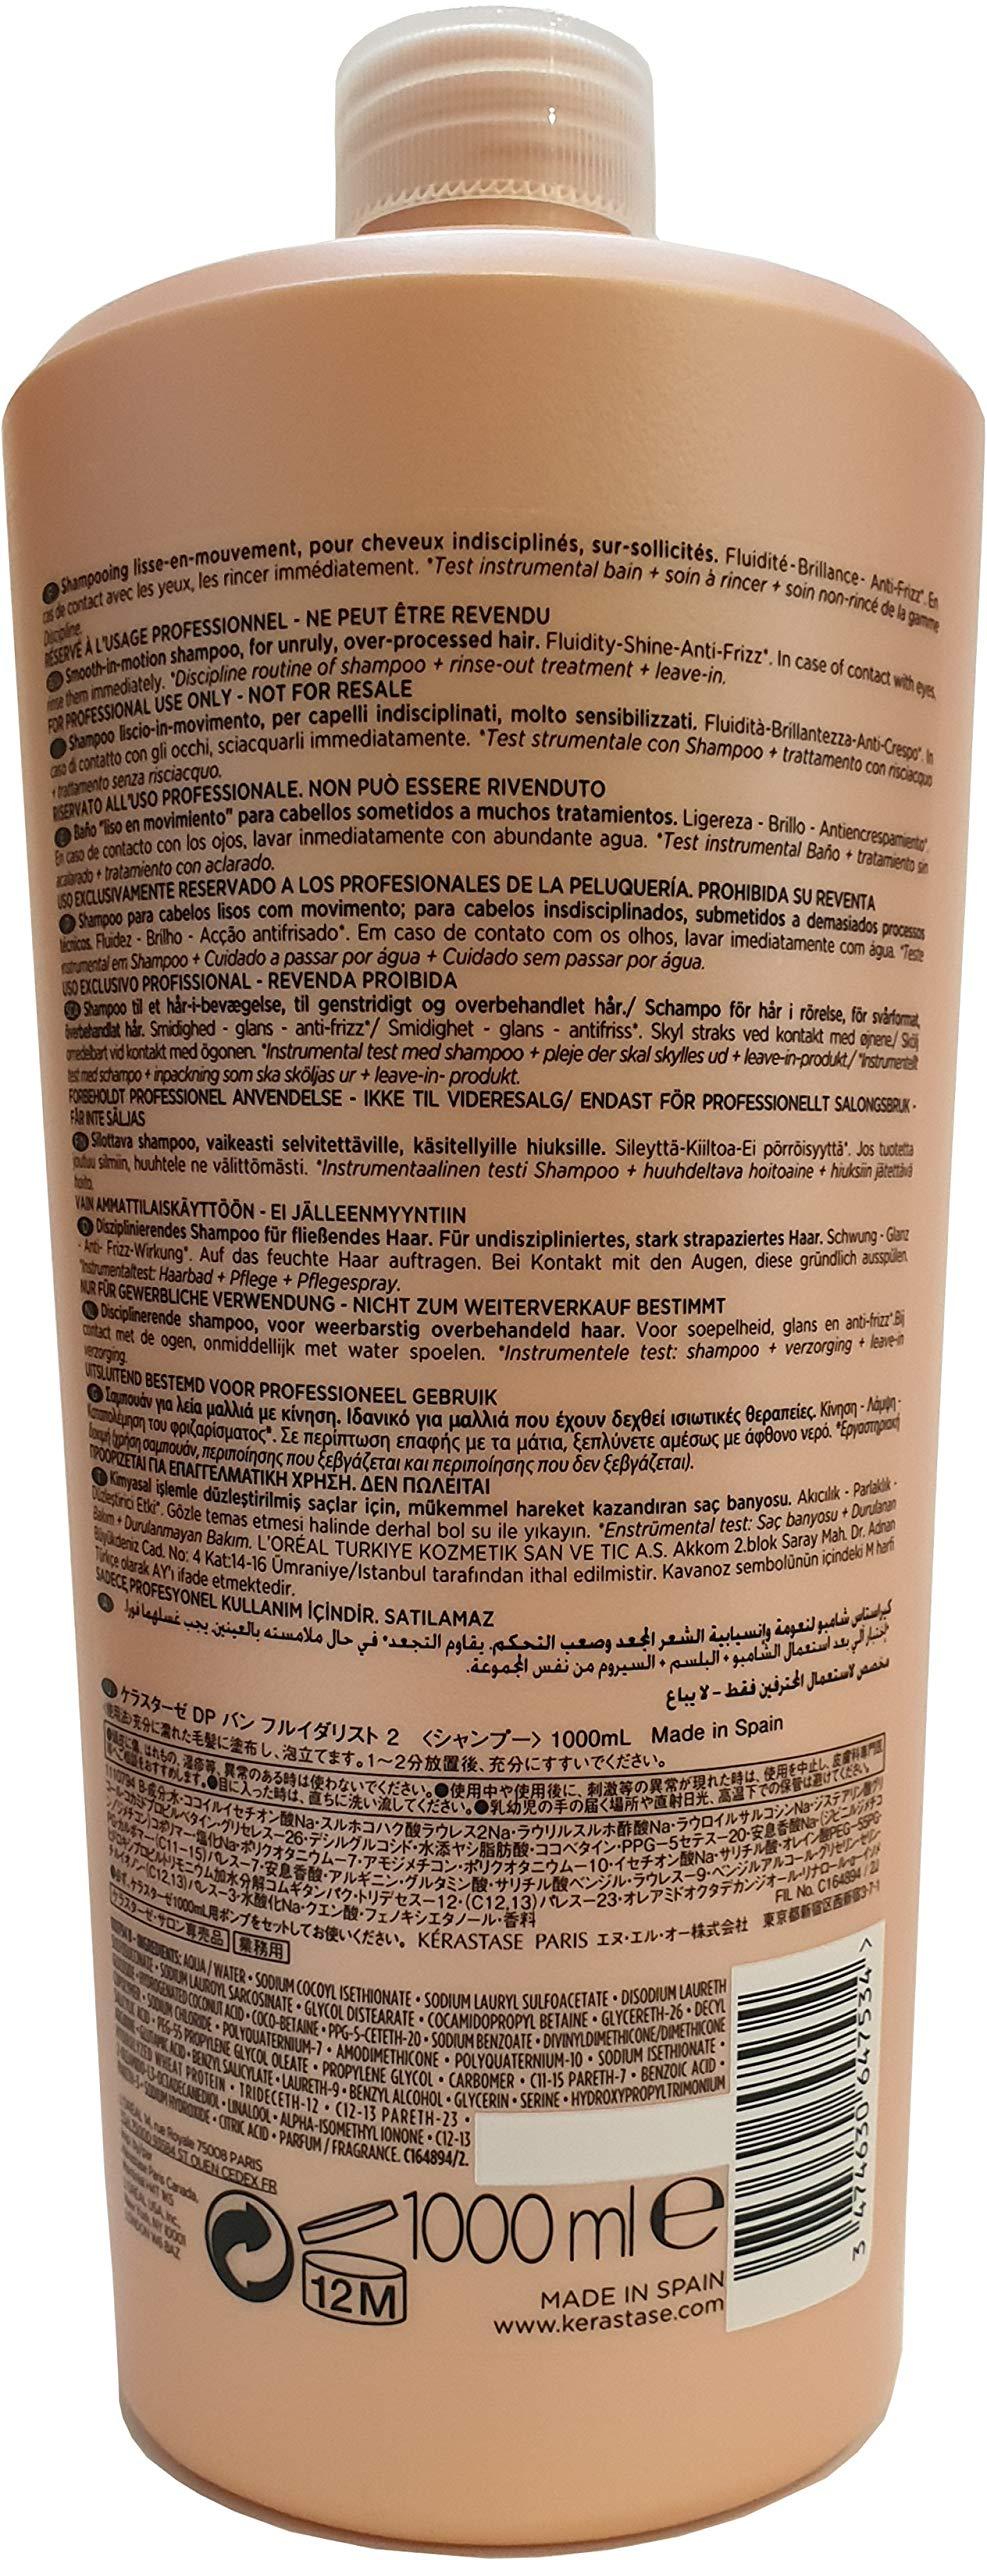 Kerastase Discipline Bain Fluidealiste No Sulfate Smooth-in-Motion Shampoo, 34 Ounce by Kerastase (Image #2)